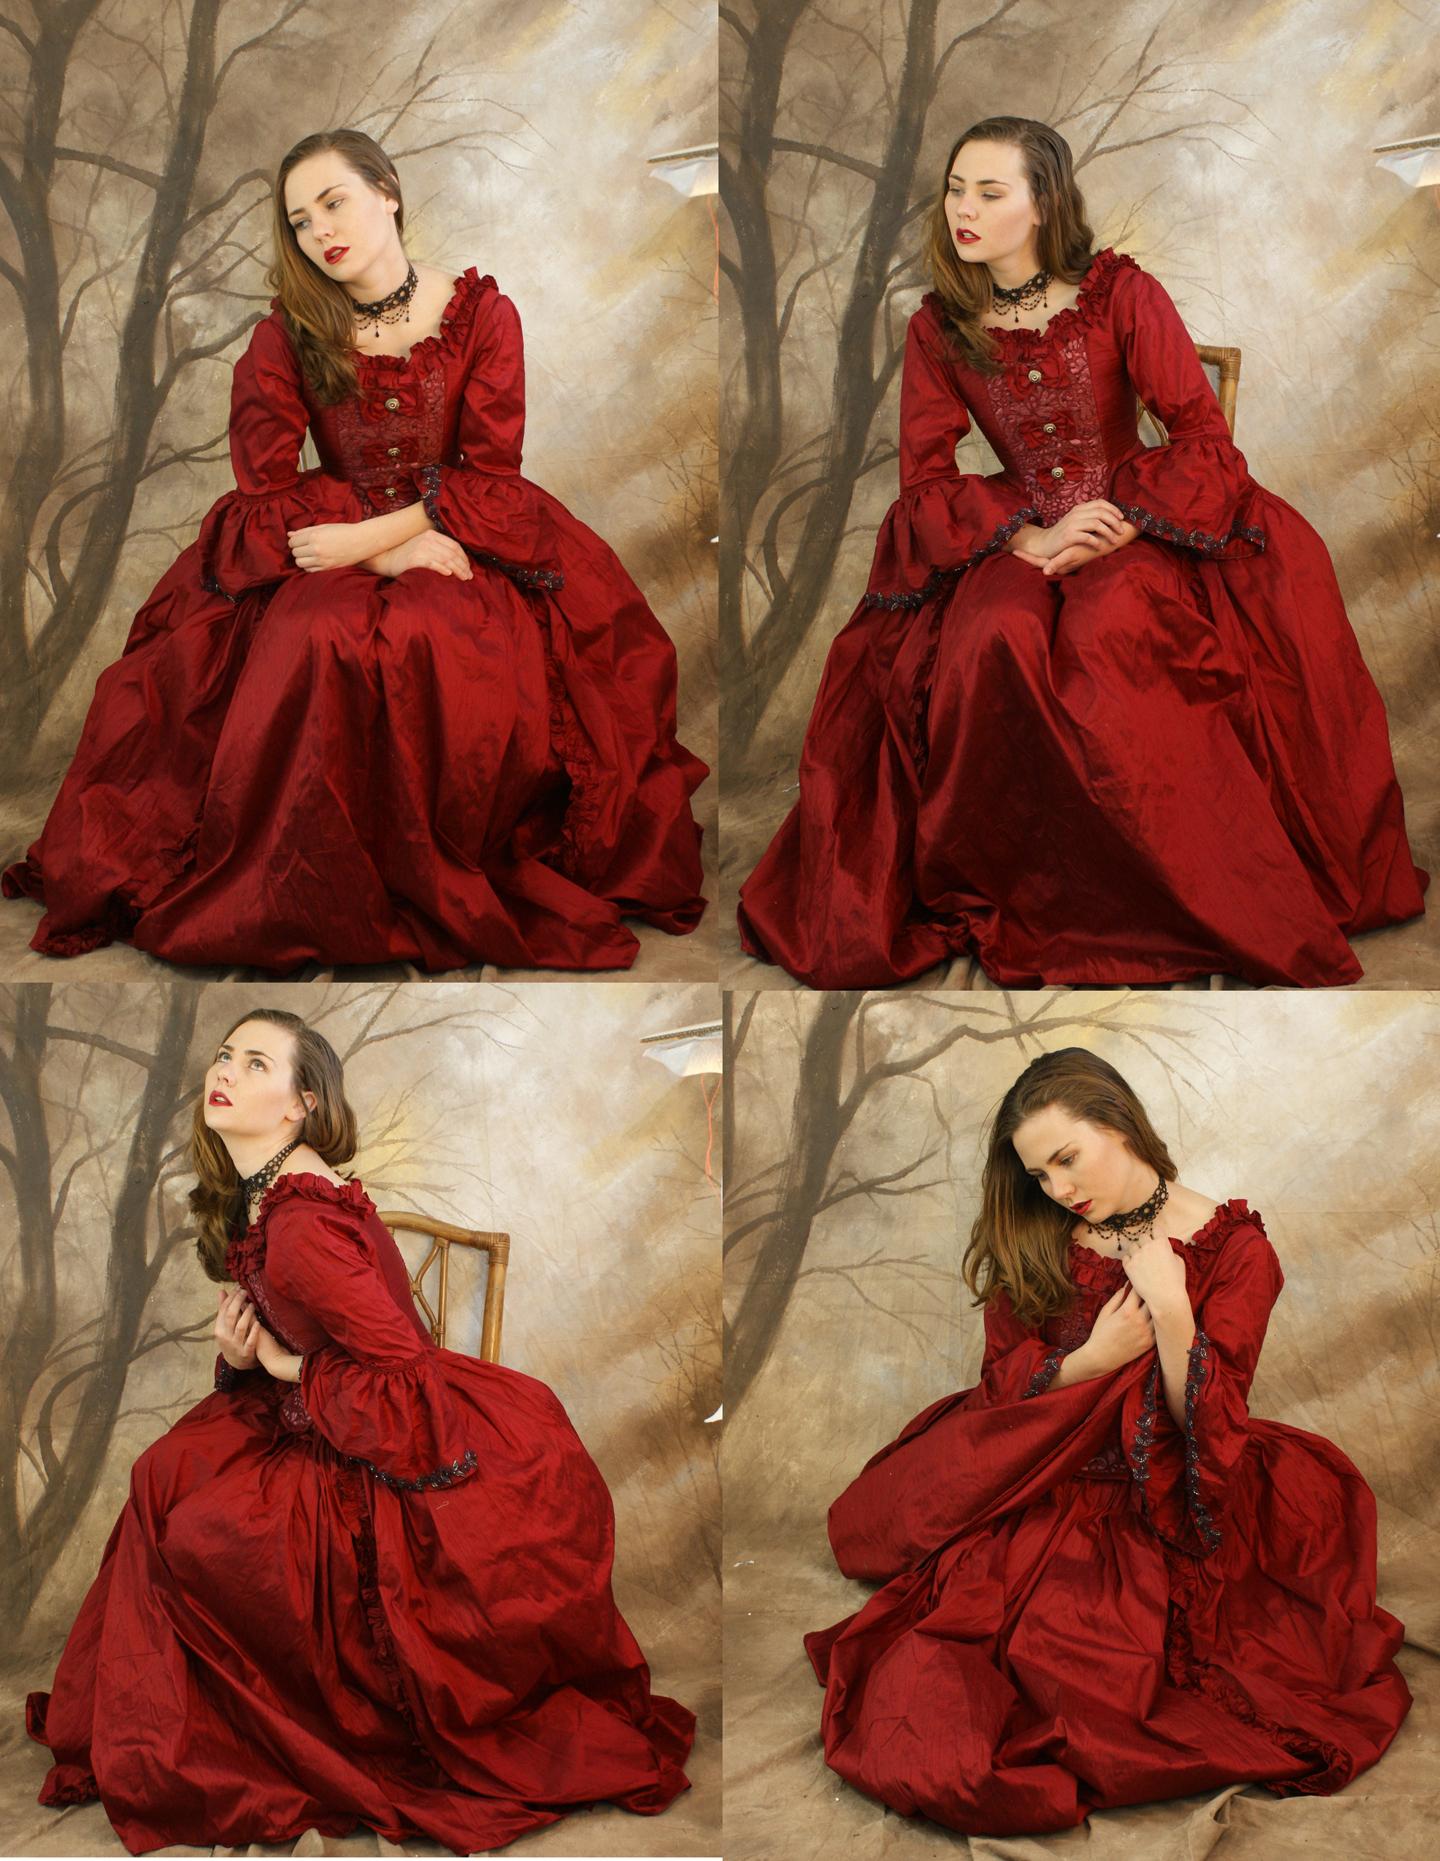 red dress set 1